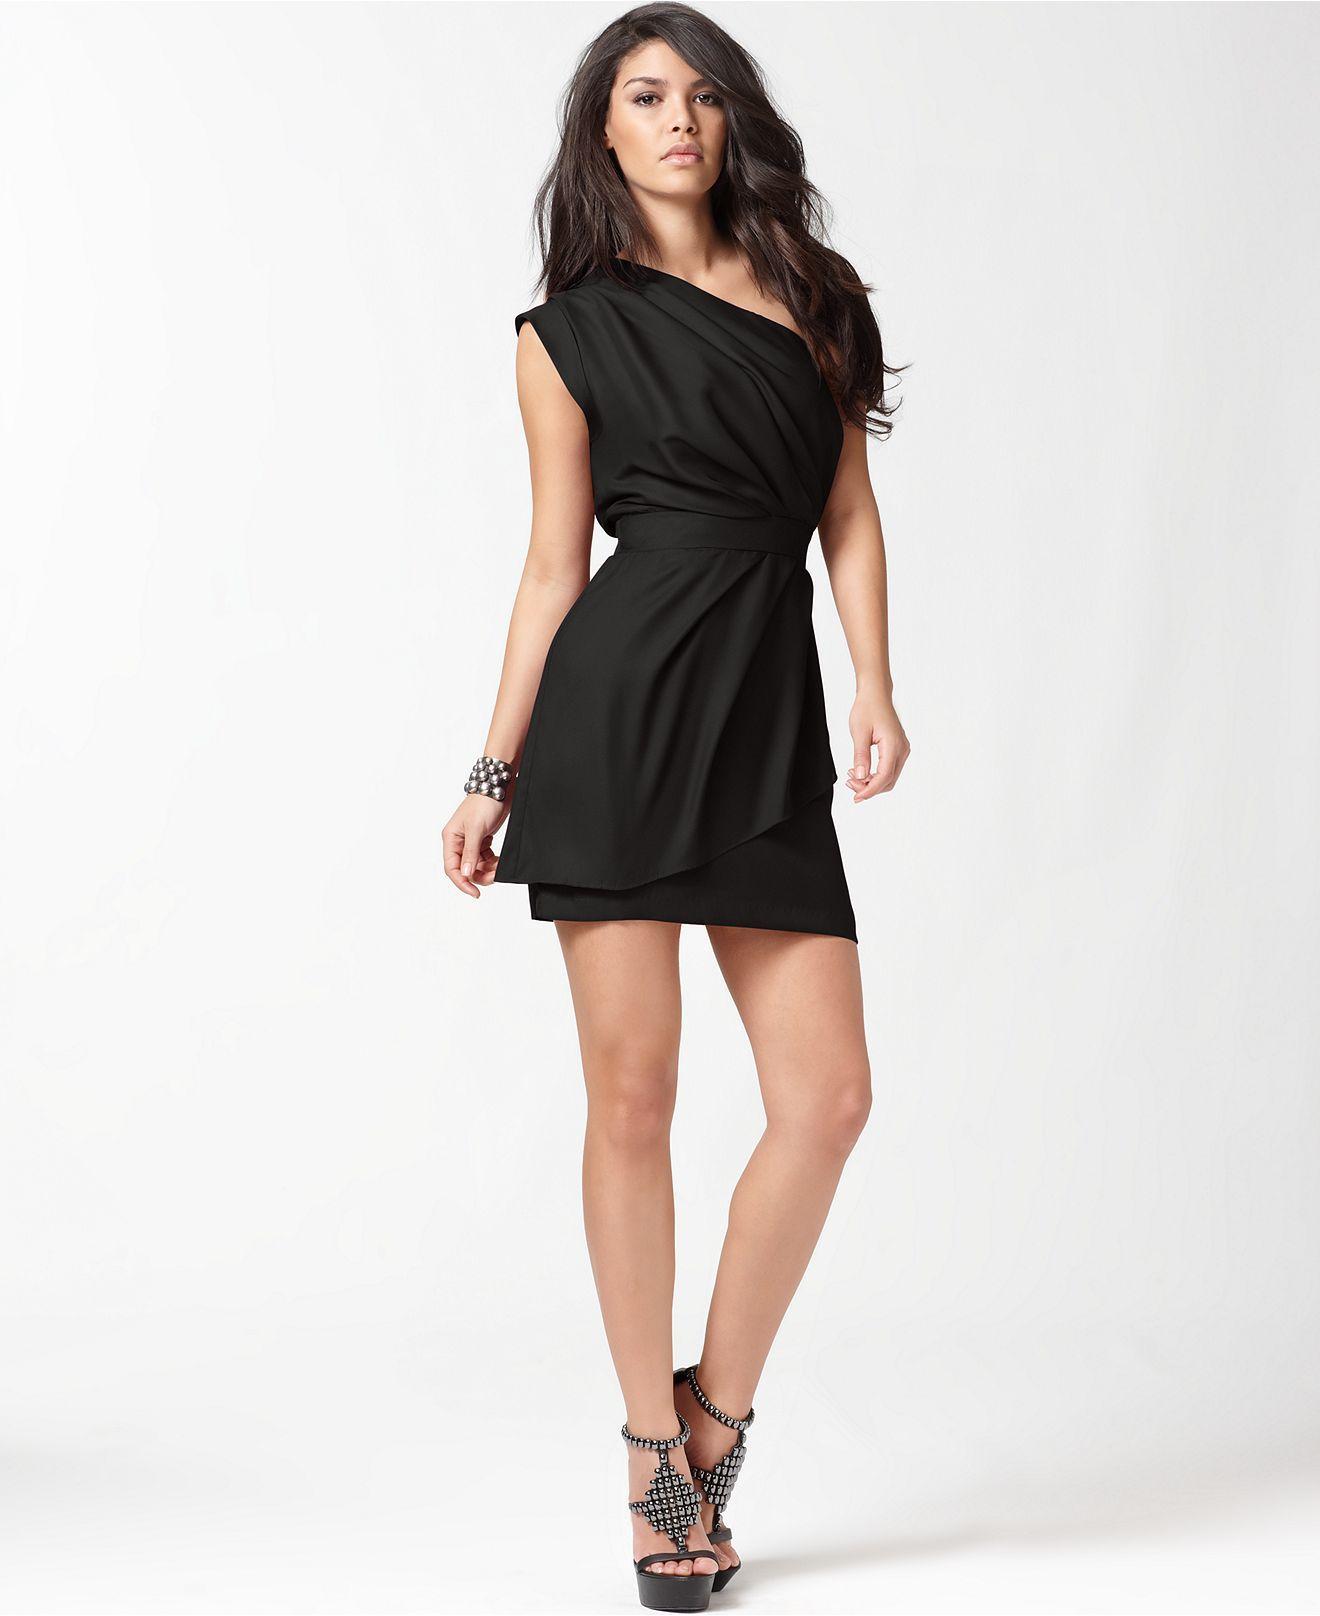 BCBGeneration one-shoulder, layered pleated black dress $118